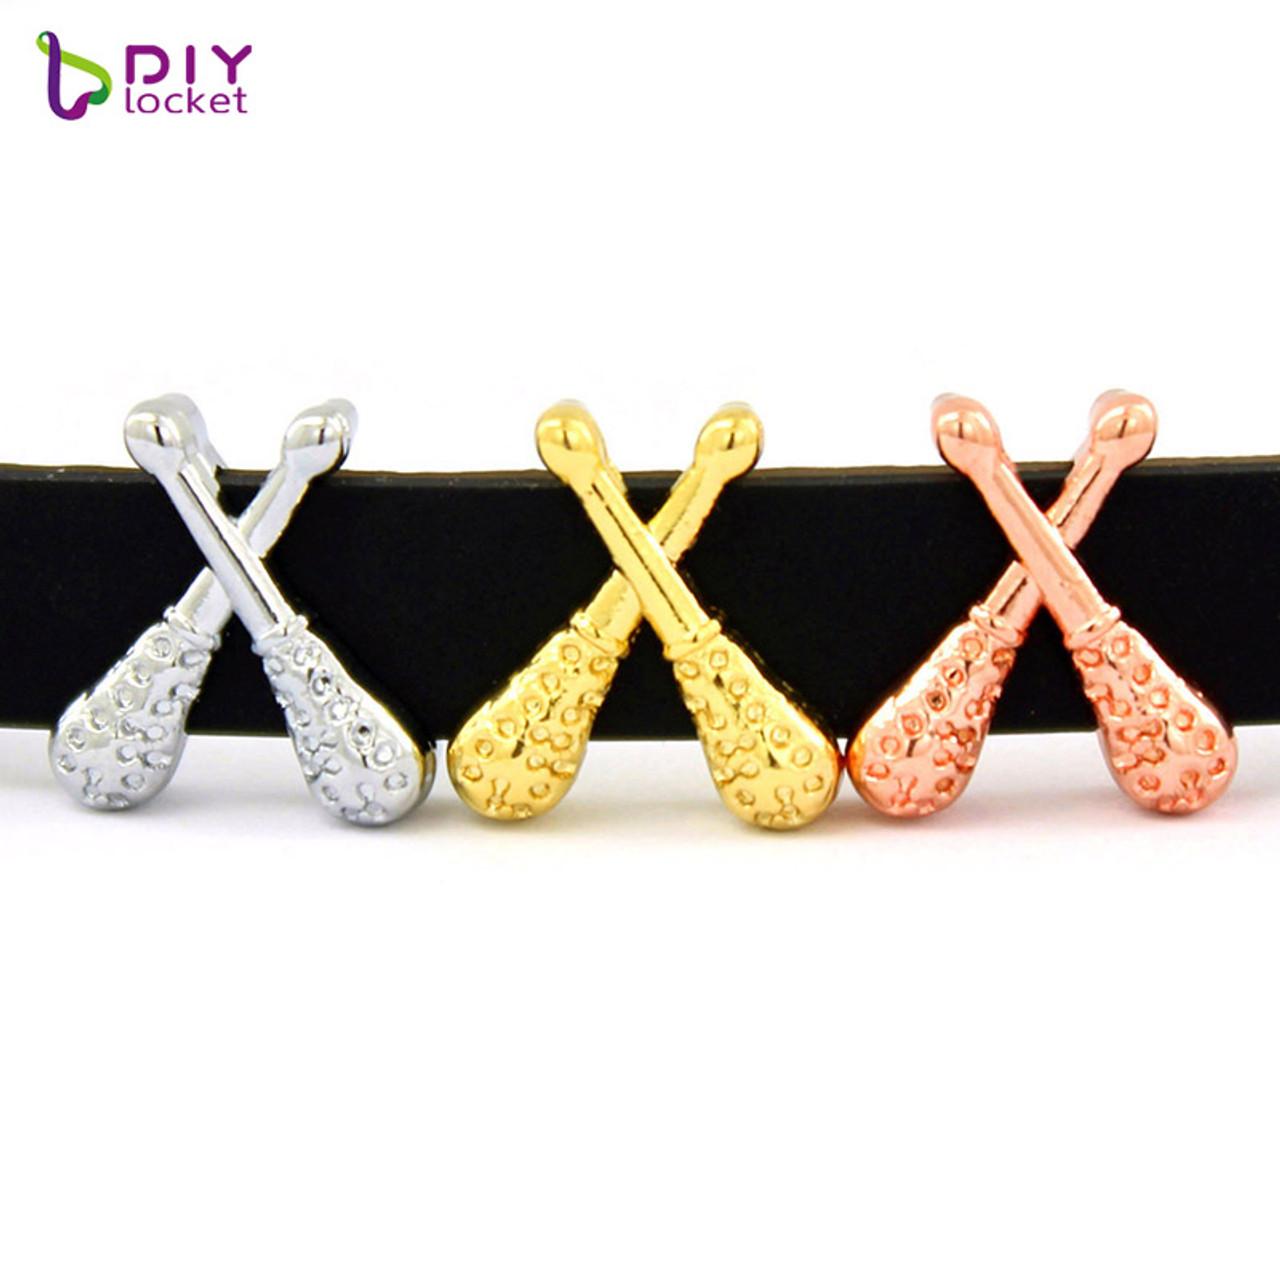 10pcs/lot Baseball 8MM Slide Charms 3 colors, Fit DIY Wristband Belt &  Bracelet LSSC354